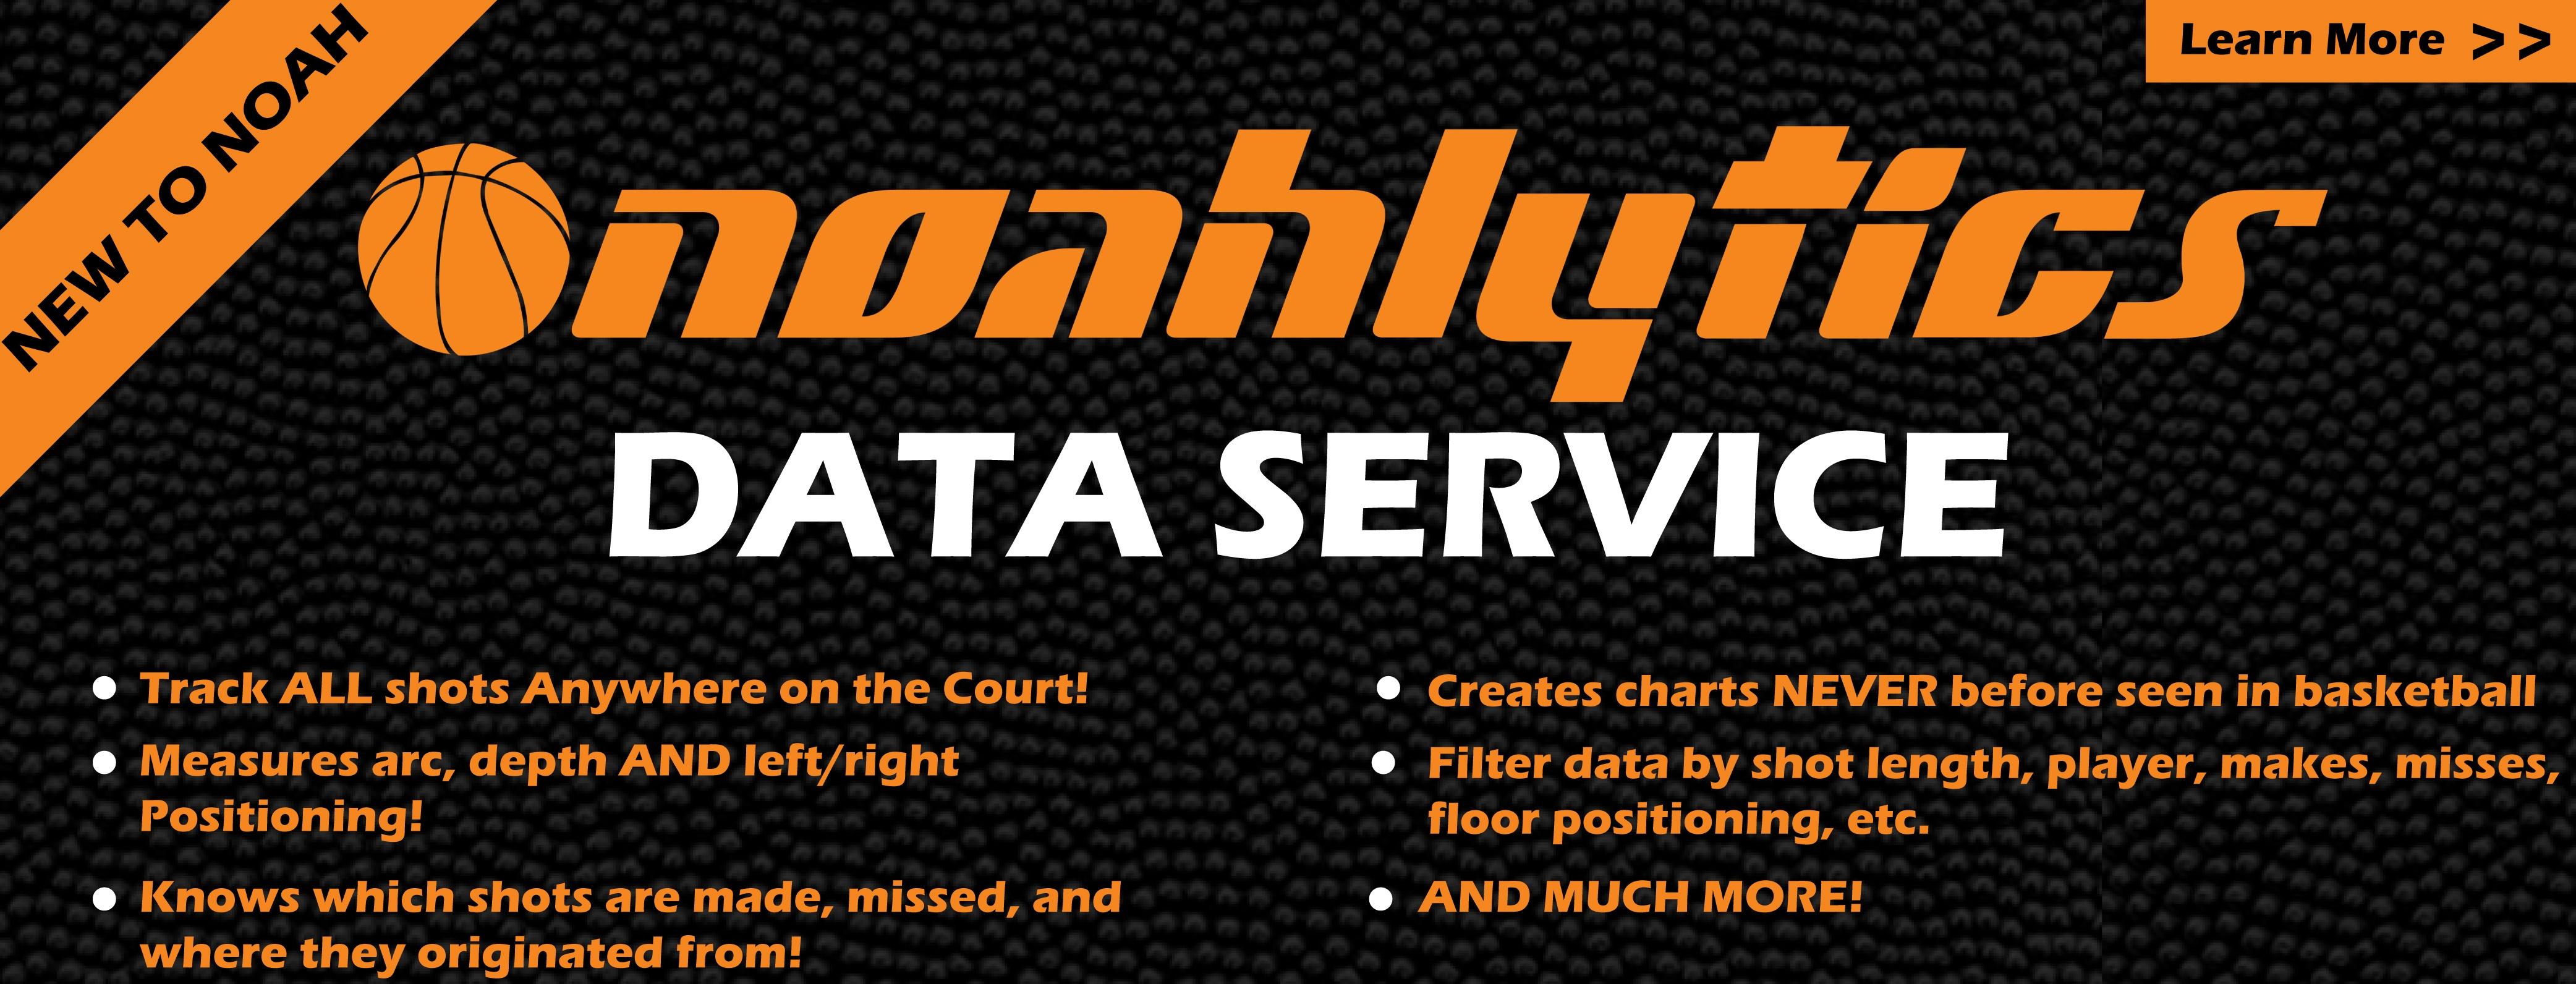 Noahlytics Data Service